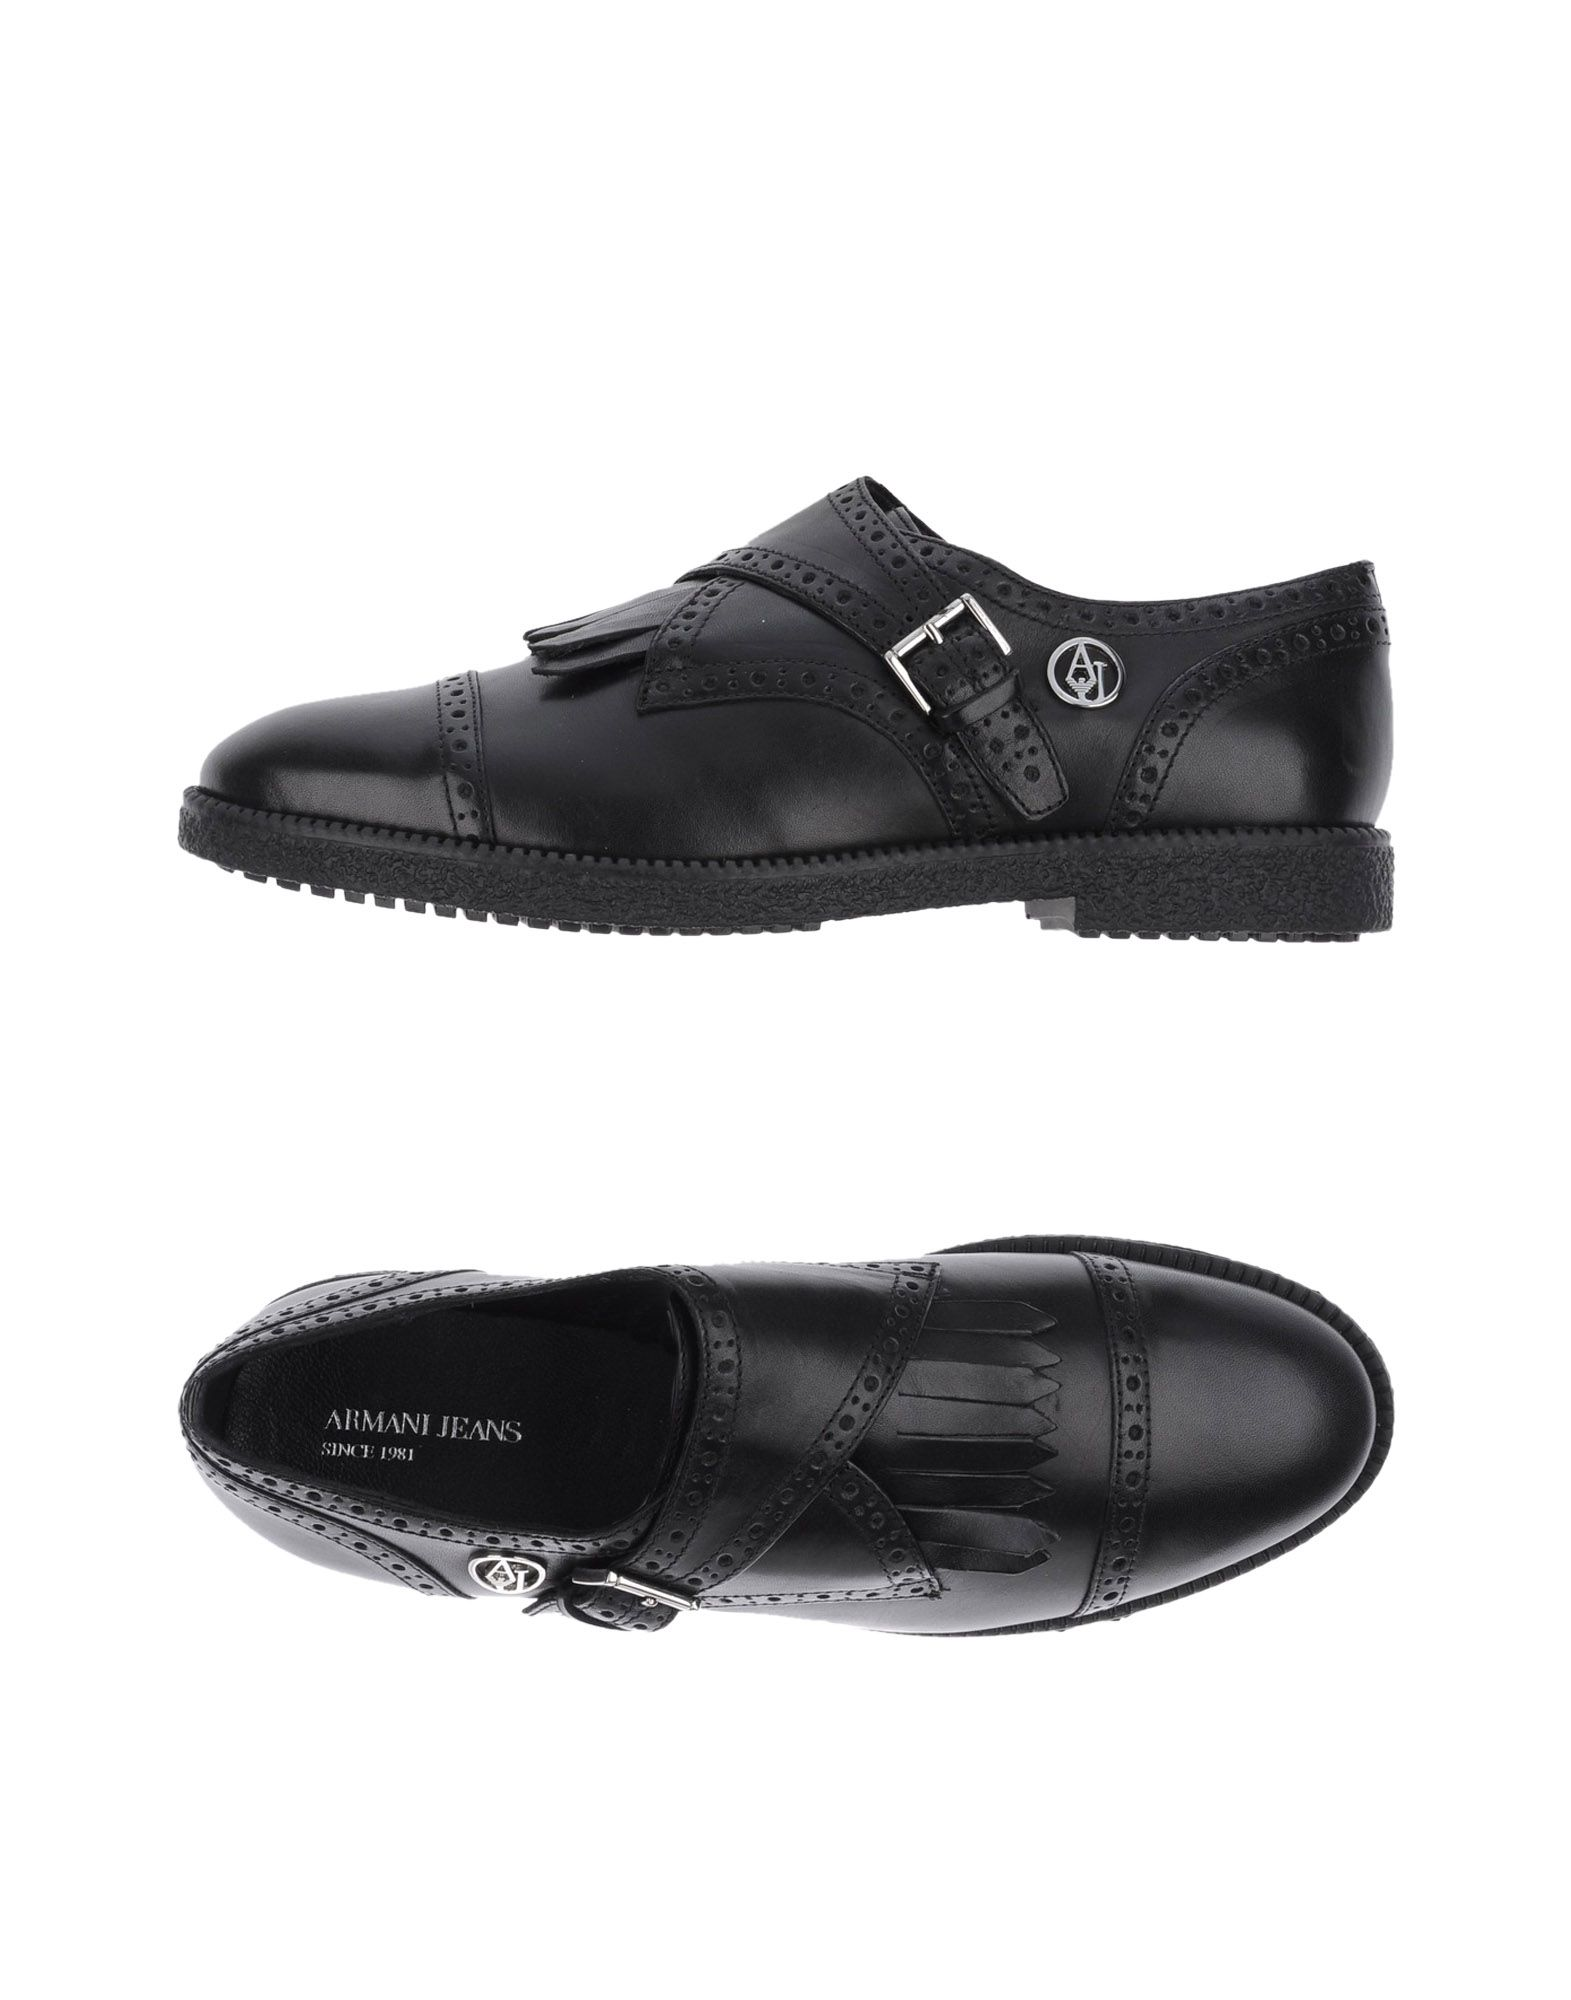 Armani Jeans Mokassins Damen  11308791MR Gute Qualität beliebte Schuhe